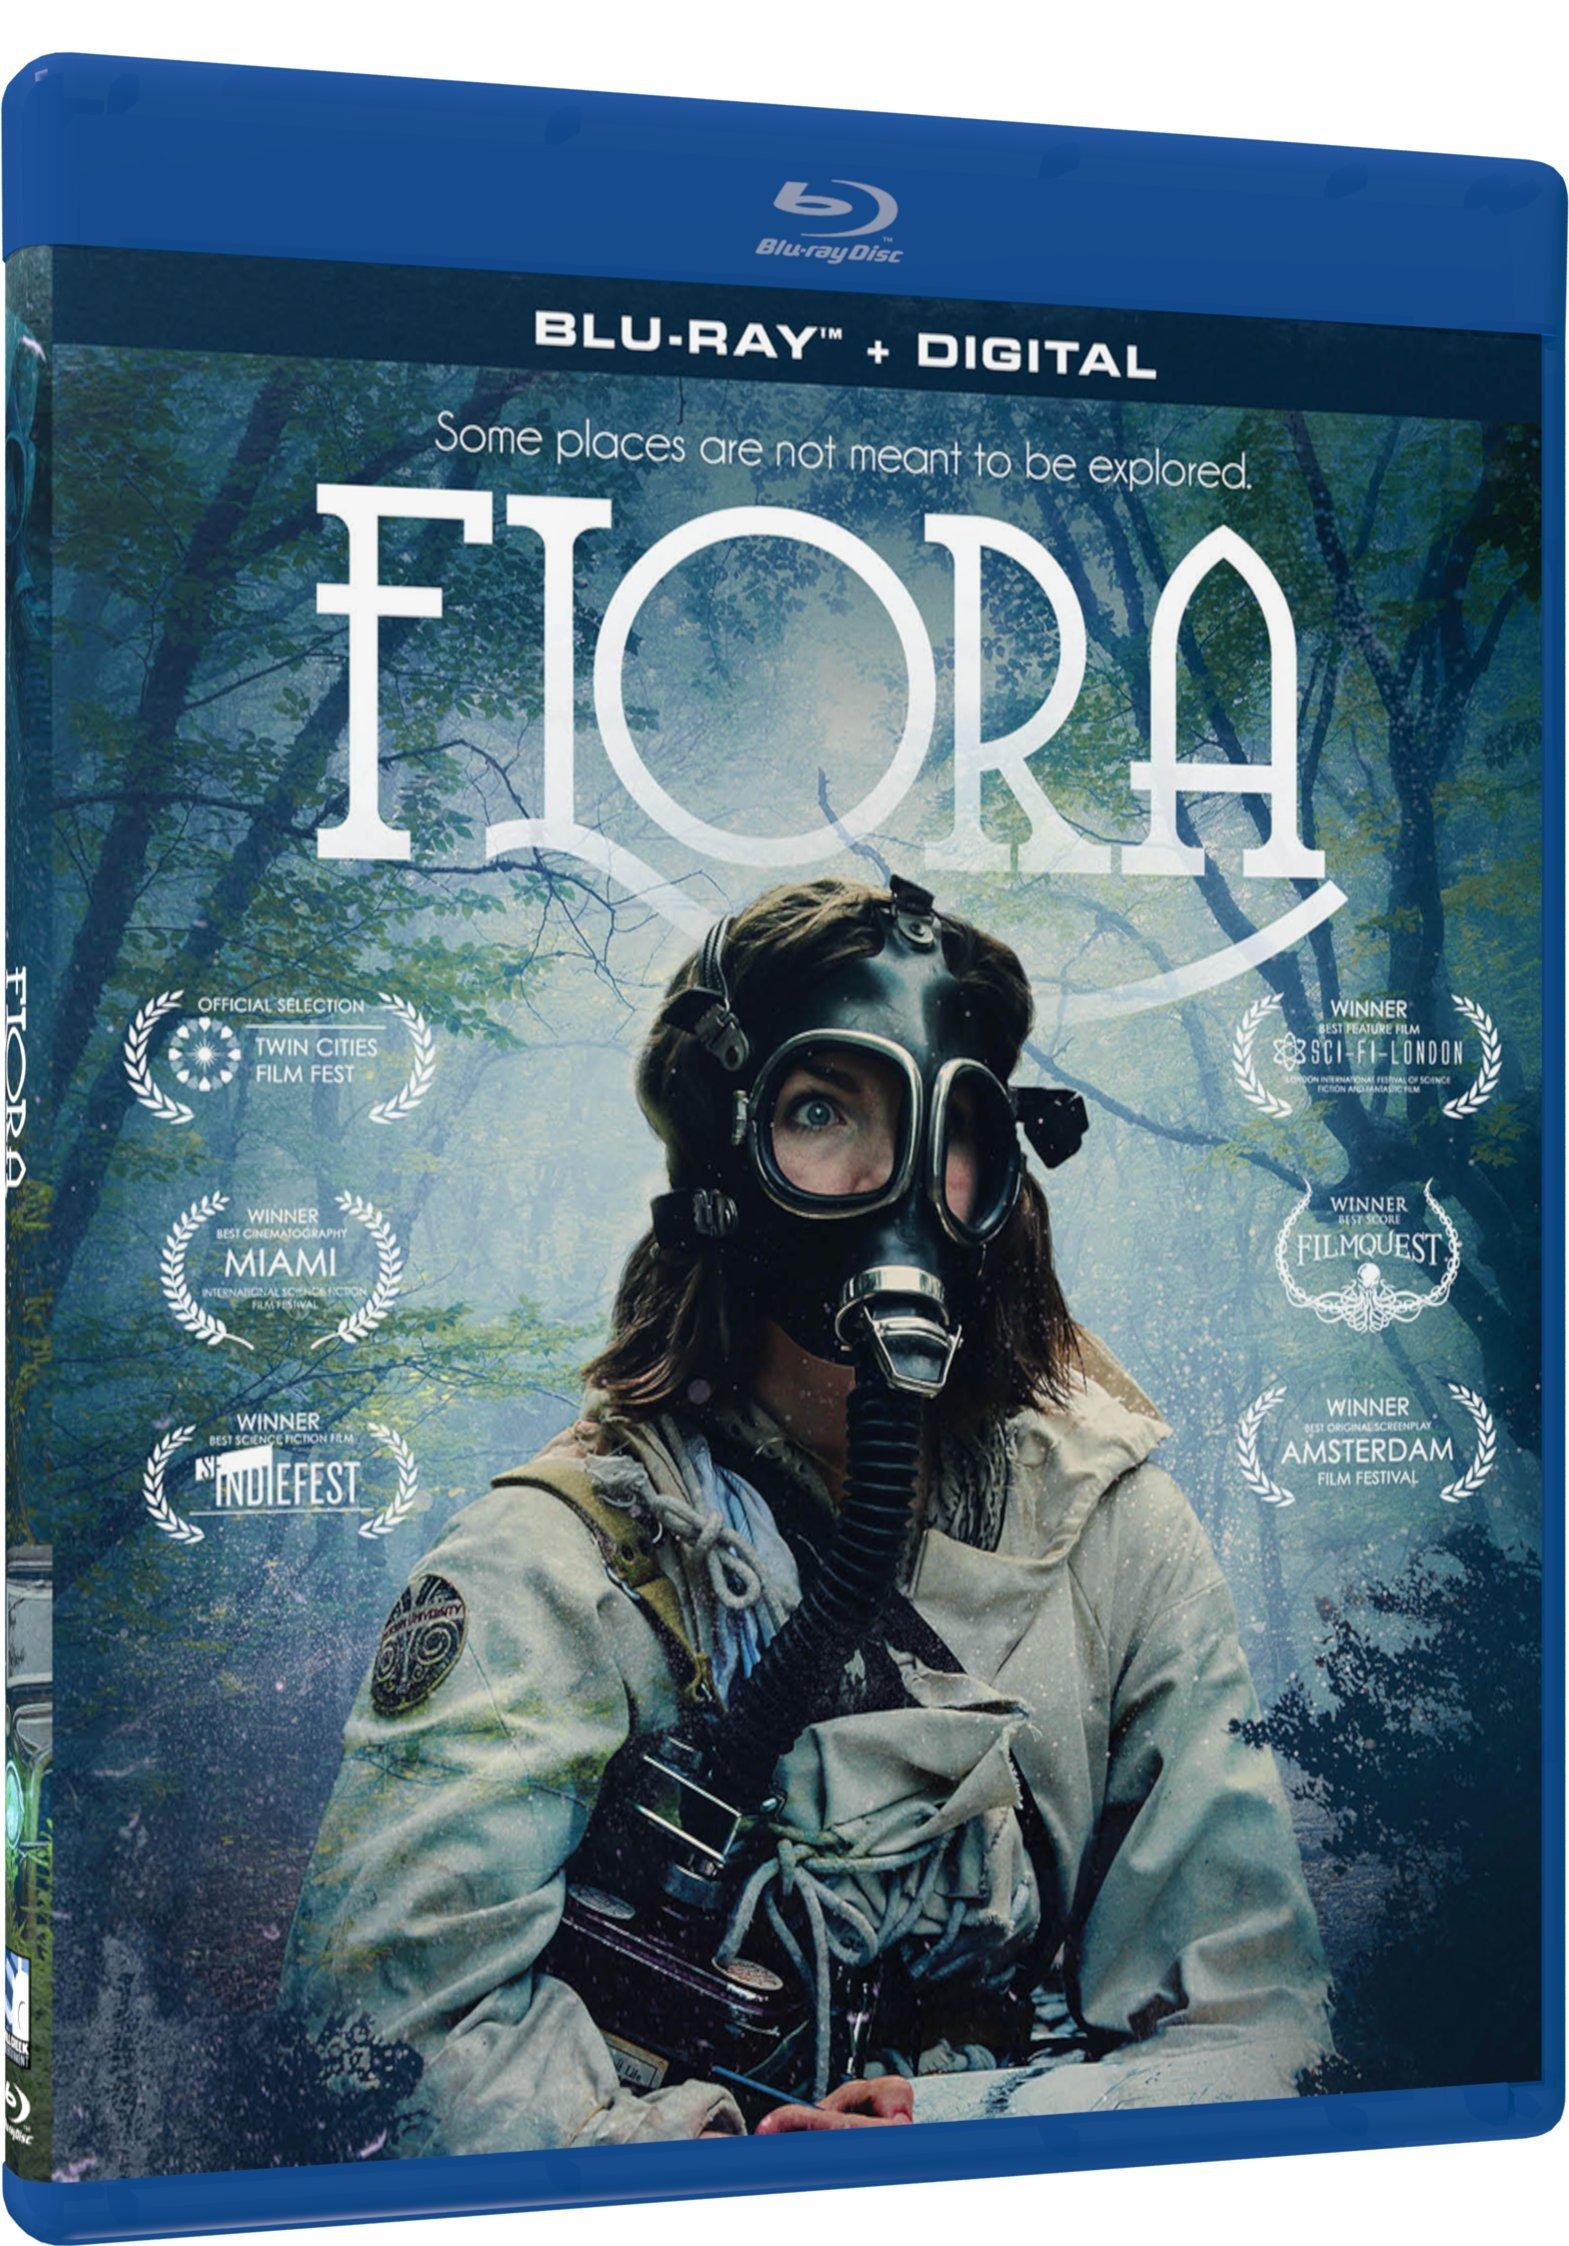 Blu-ray : Flora (Blu-ray)